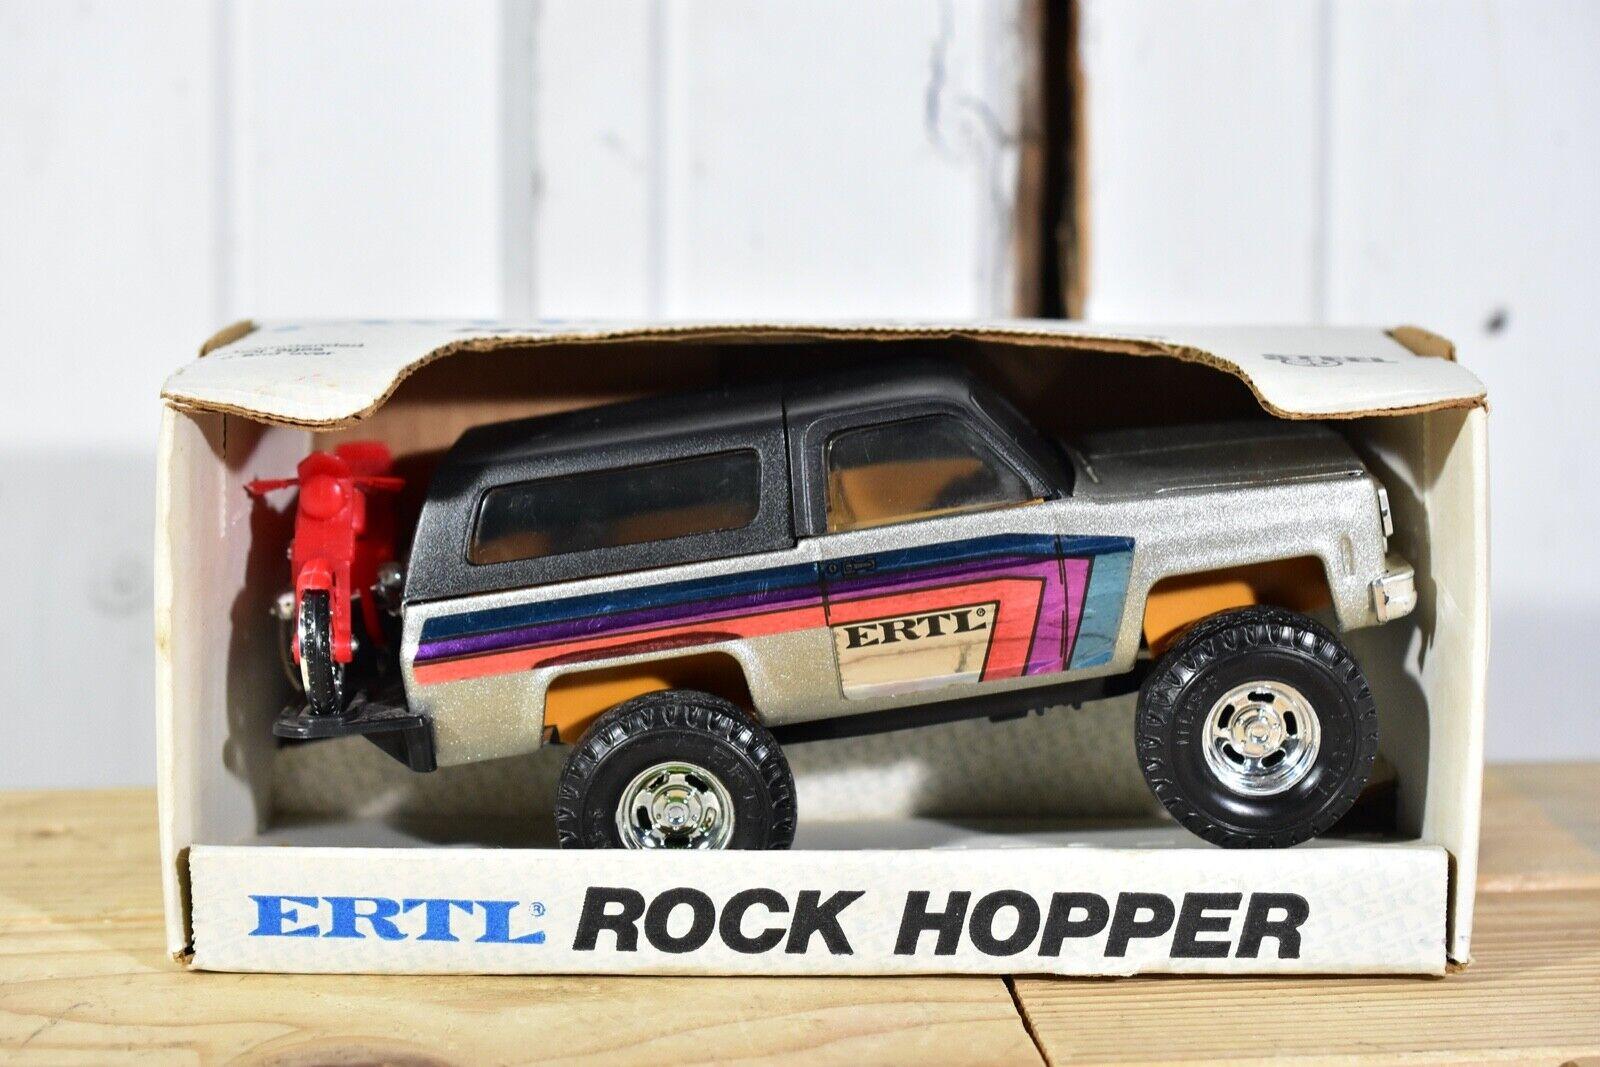 RARE Jahr CHEVROLET CHEVY ERTL BLAZER ROCK HOPPER WITH MOTORCYCLE HITCH RACK